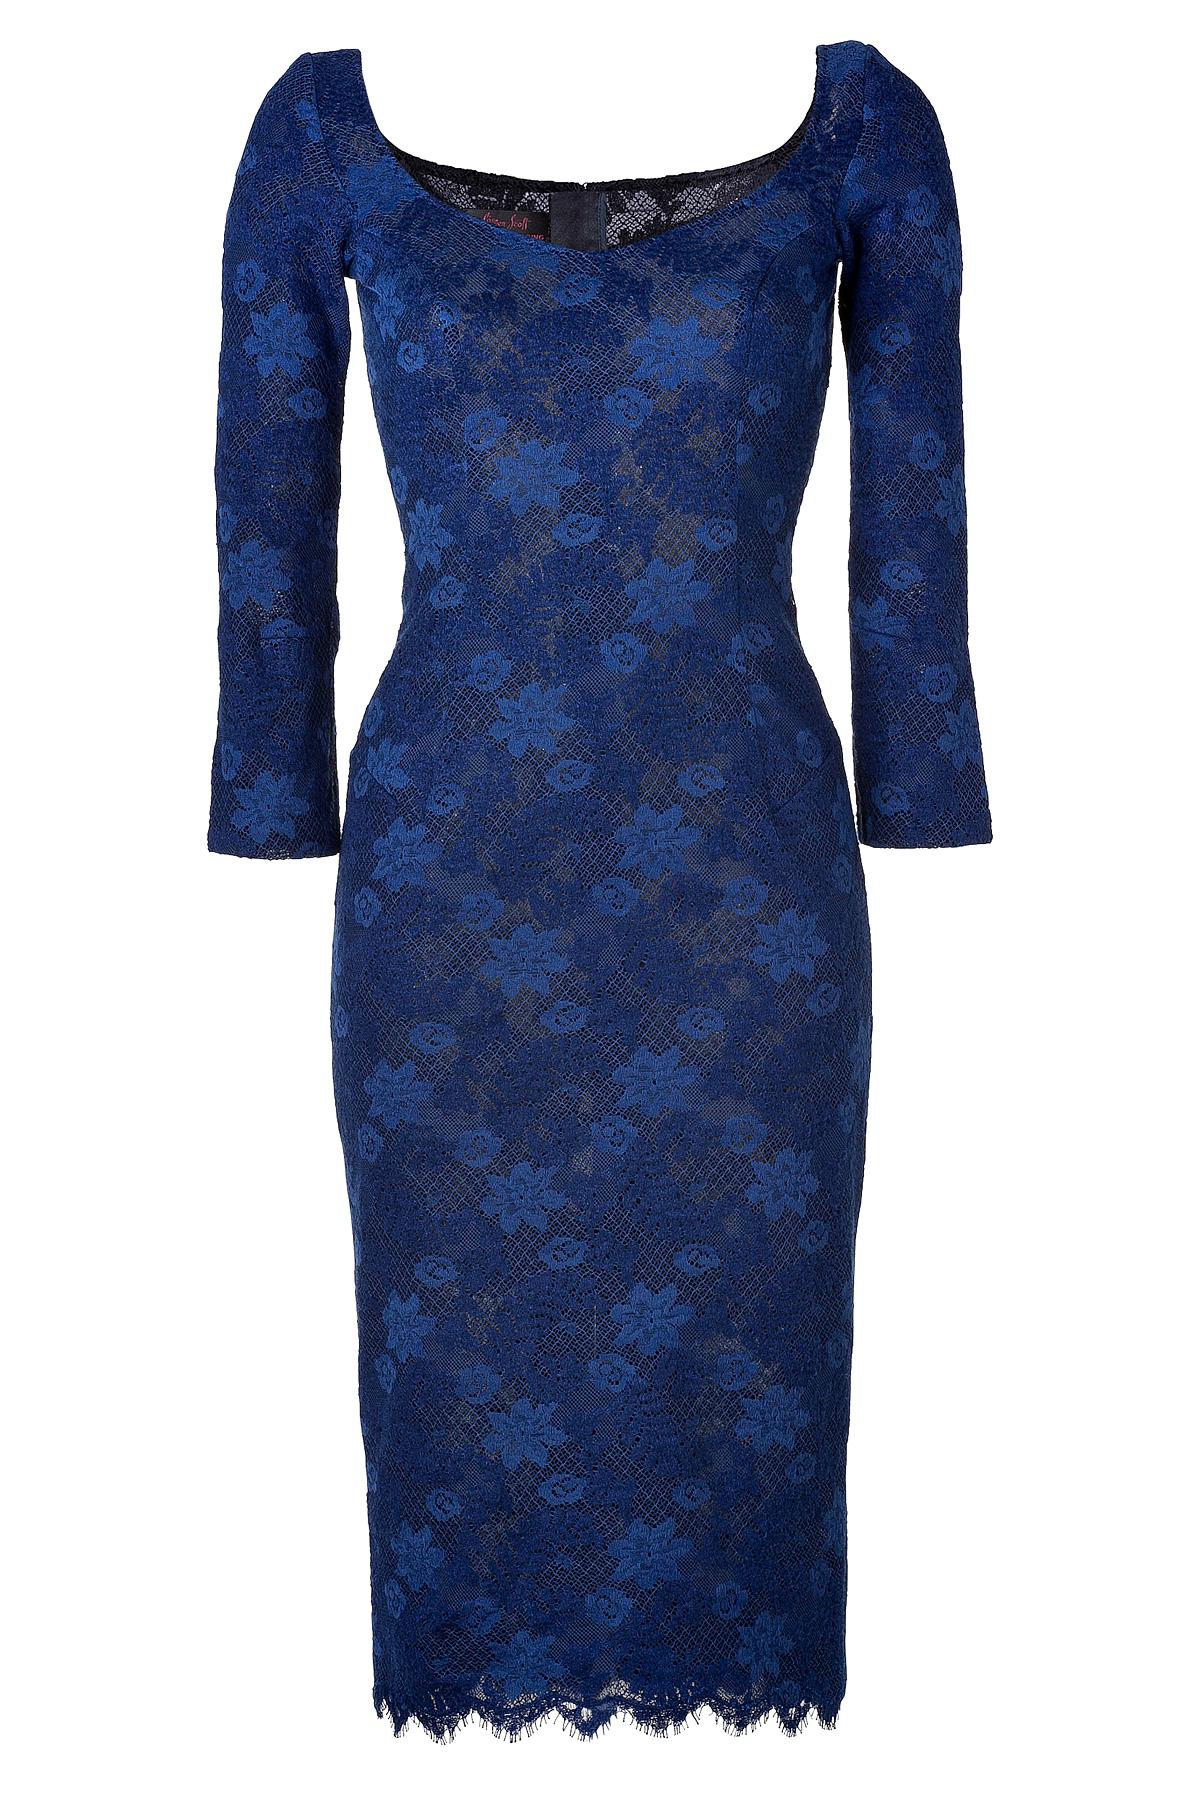 Mykonos Blue Bridesmaids Dress from StyleBop